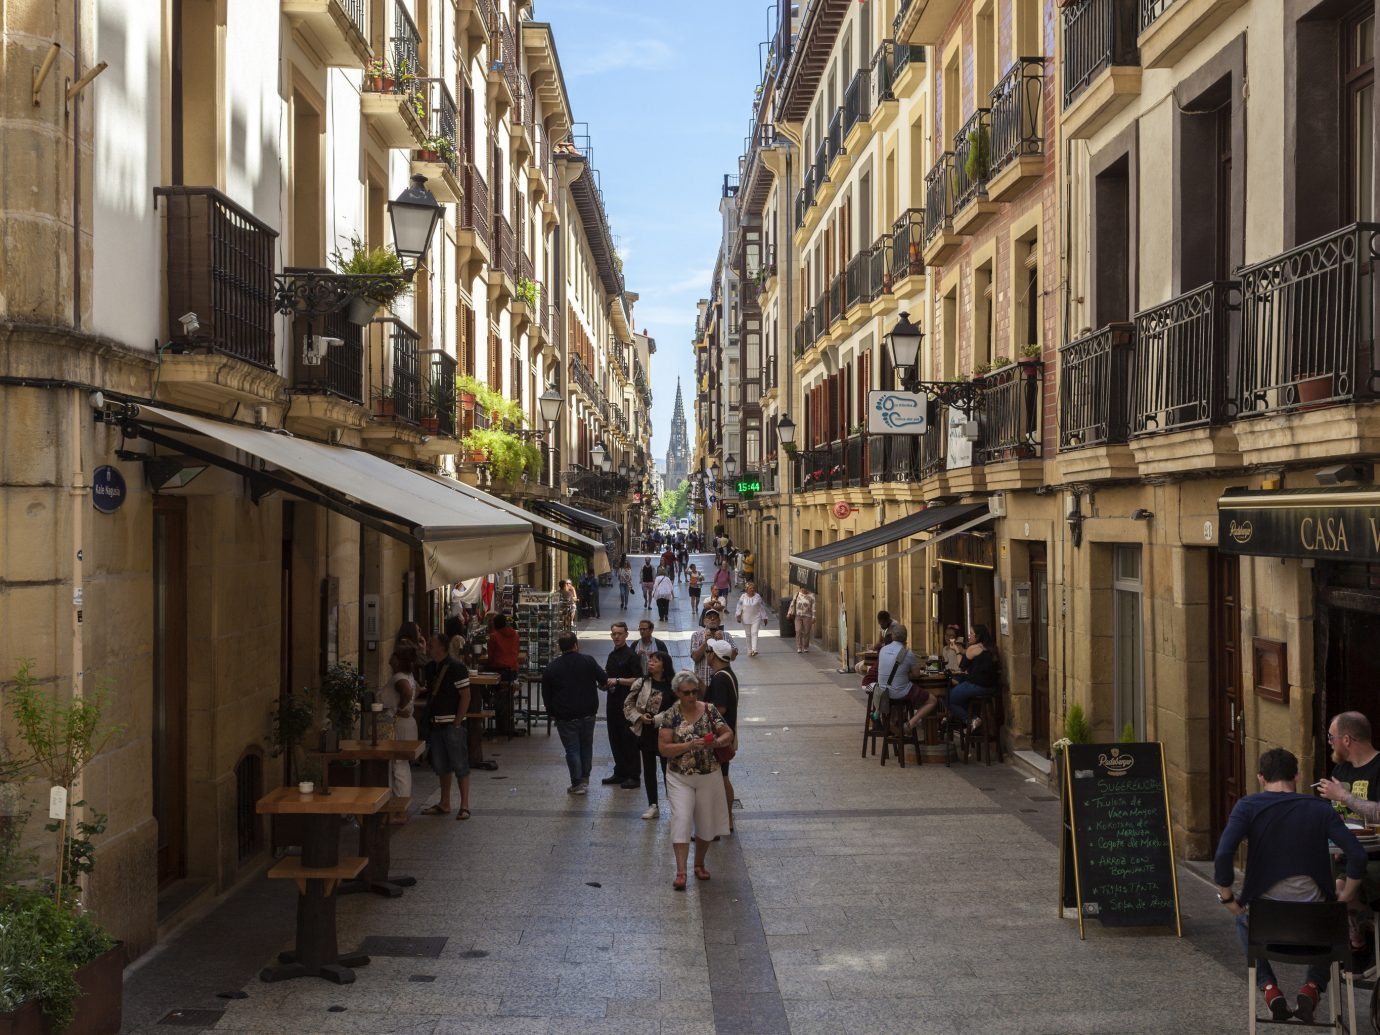 europe Spain Trip Ideas street Town neighbourhood alley City road pedestrian Downtown building facade metropolis